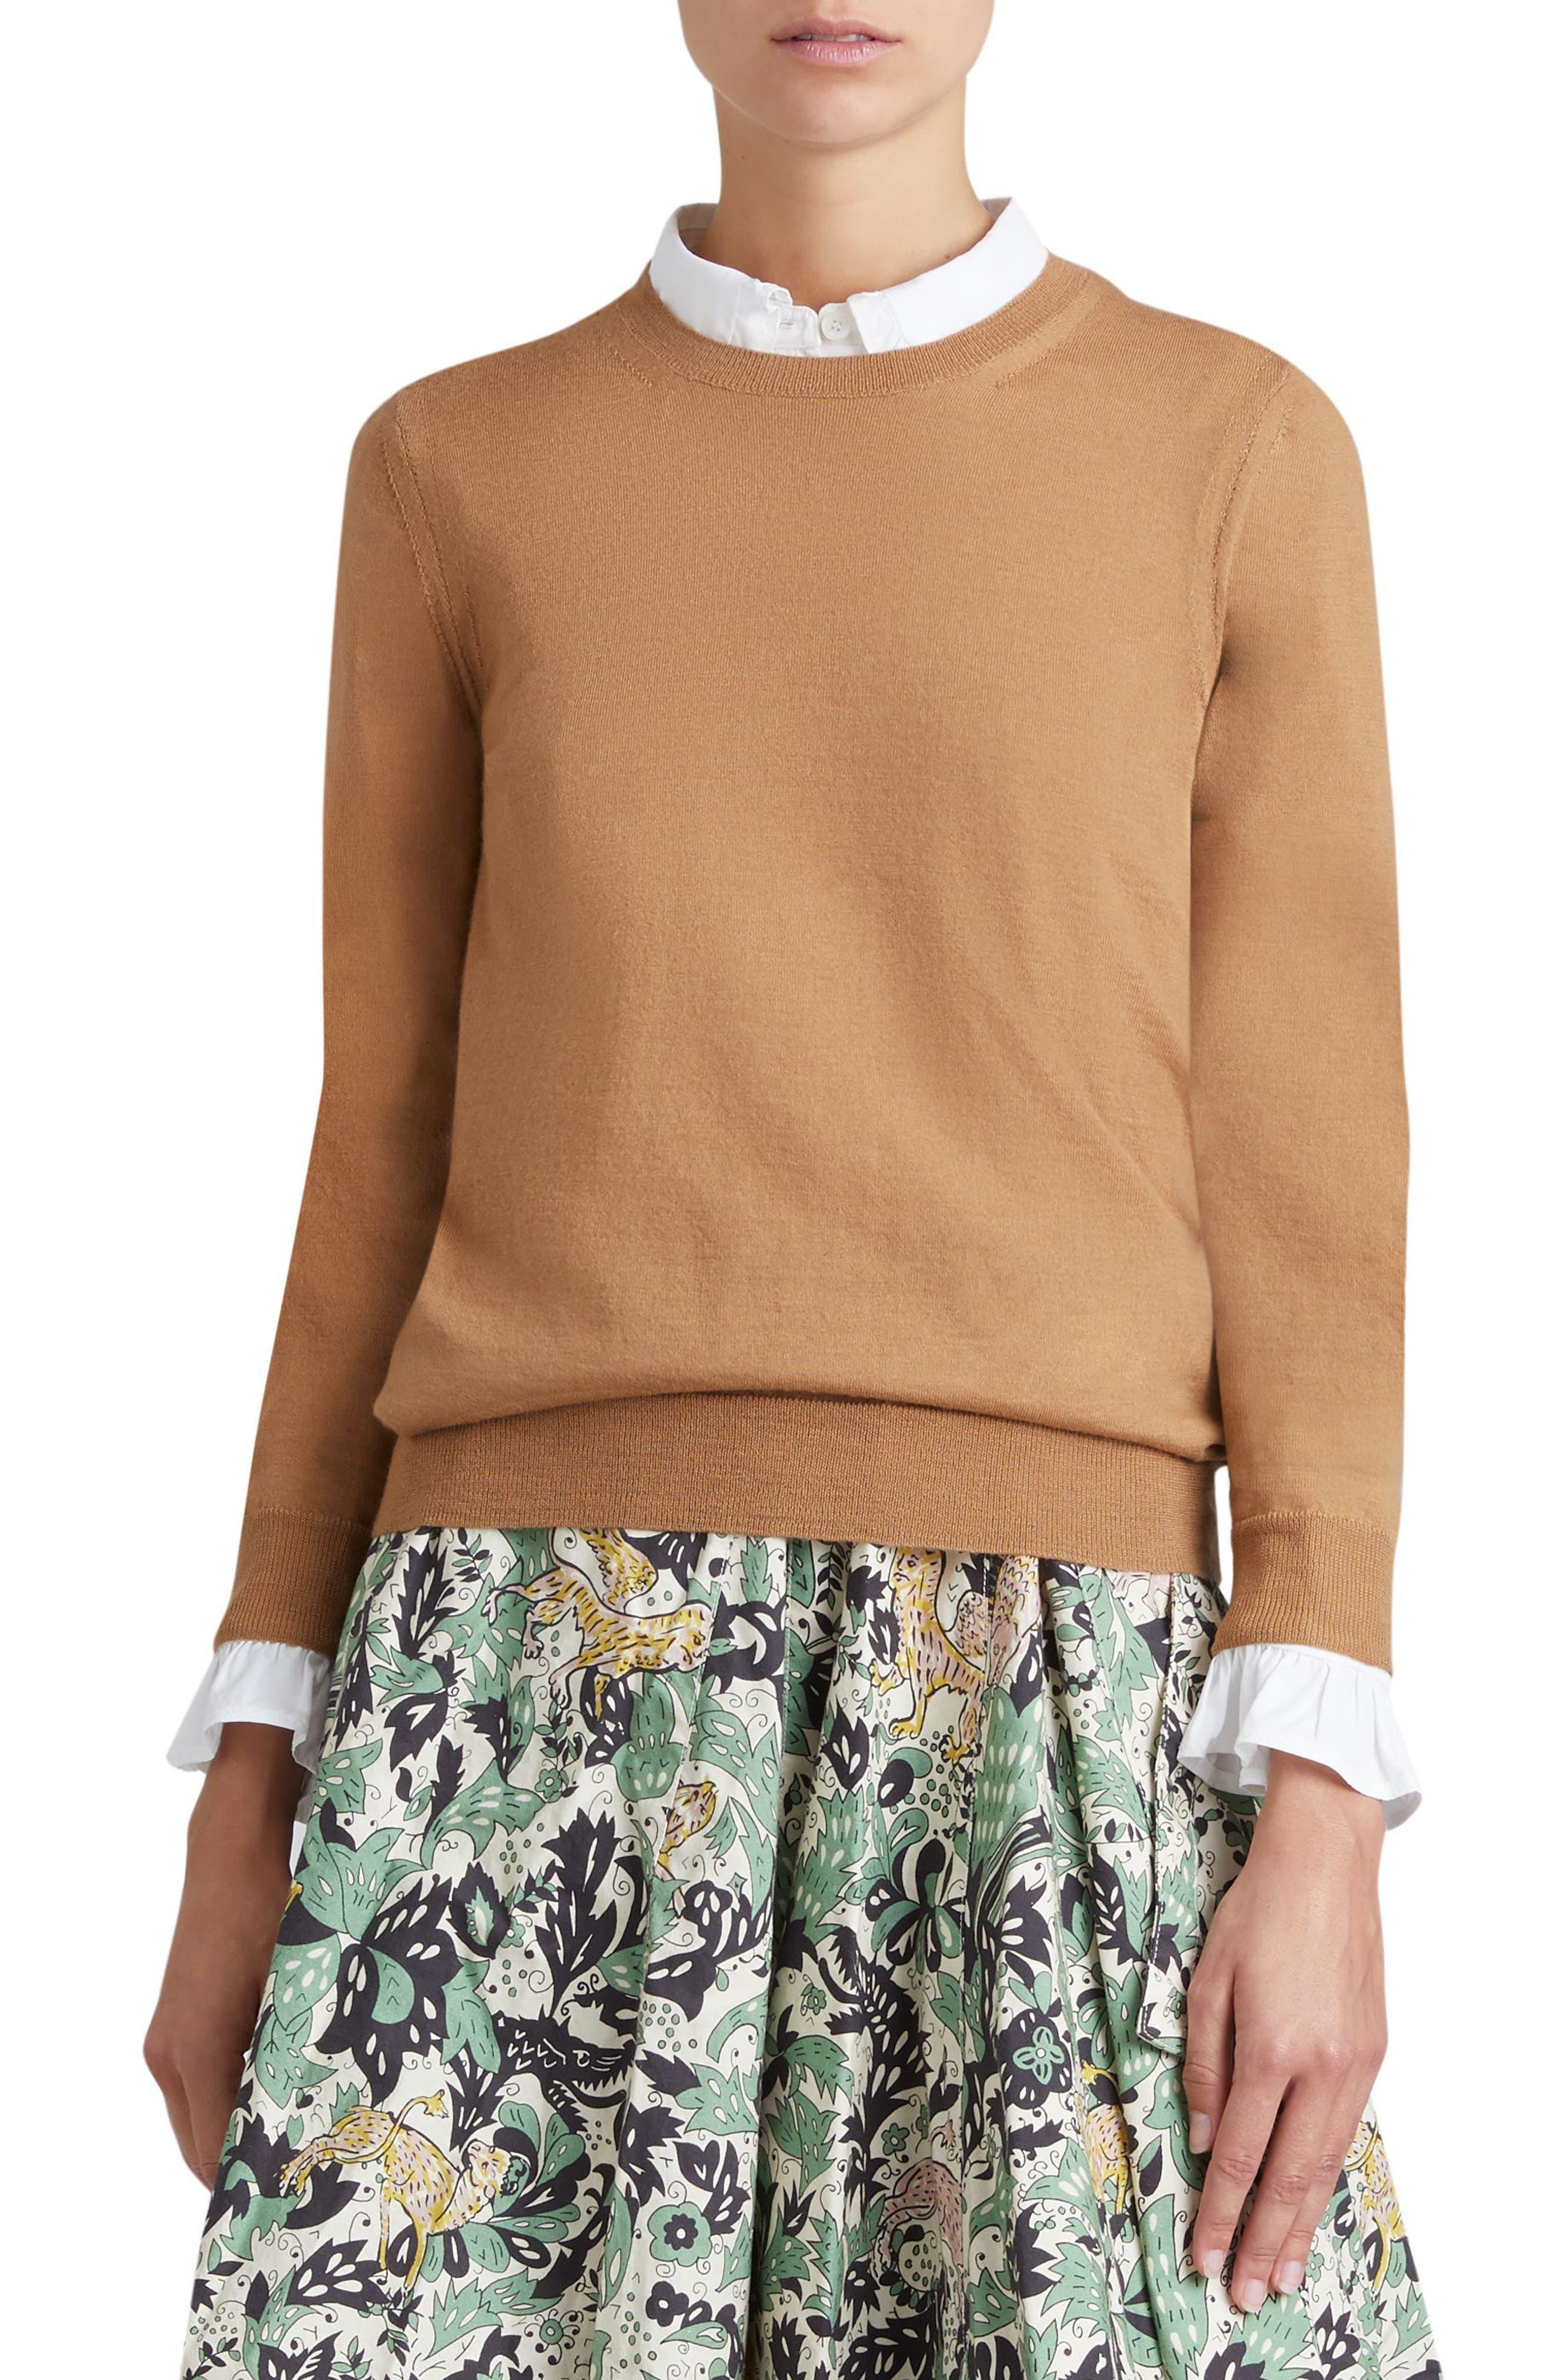 Viar Merino Wool Sweater,                         Main,                         color, Camel